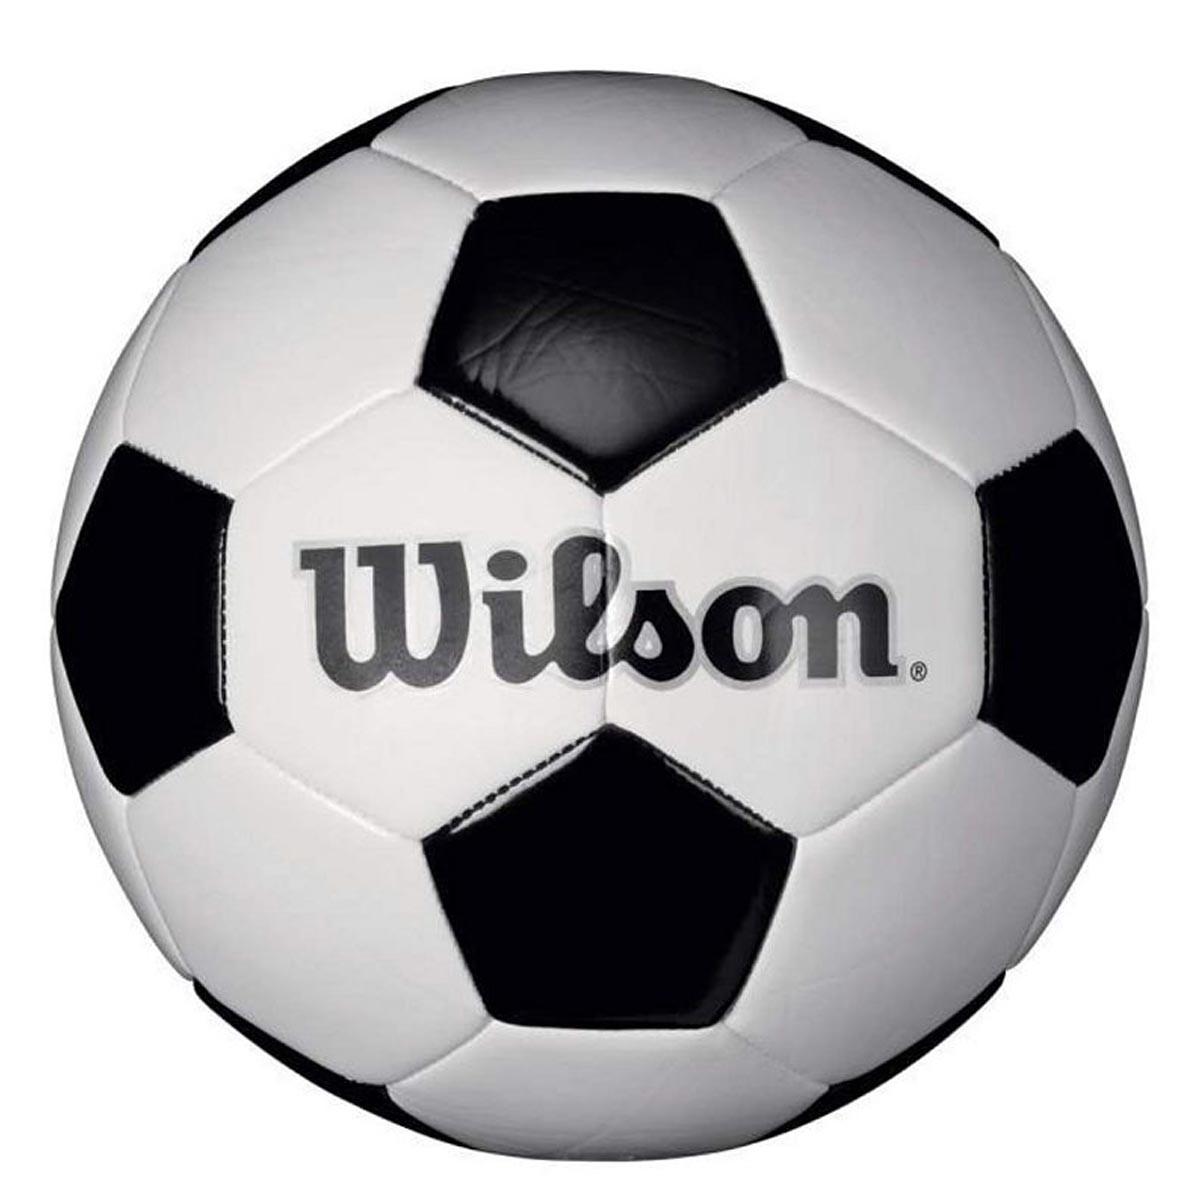 wilson soccer ball size 3 seatle davidjoel co